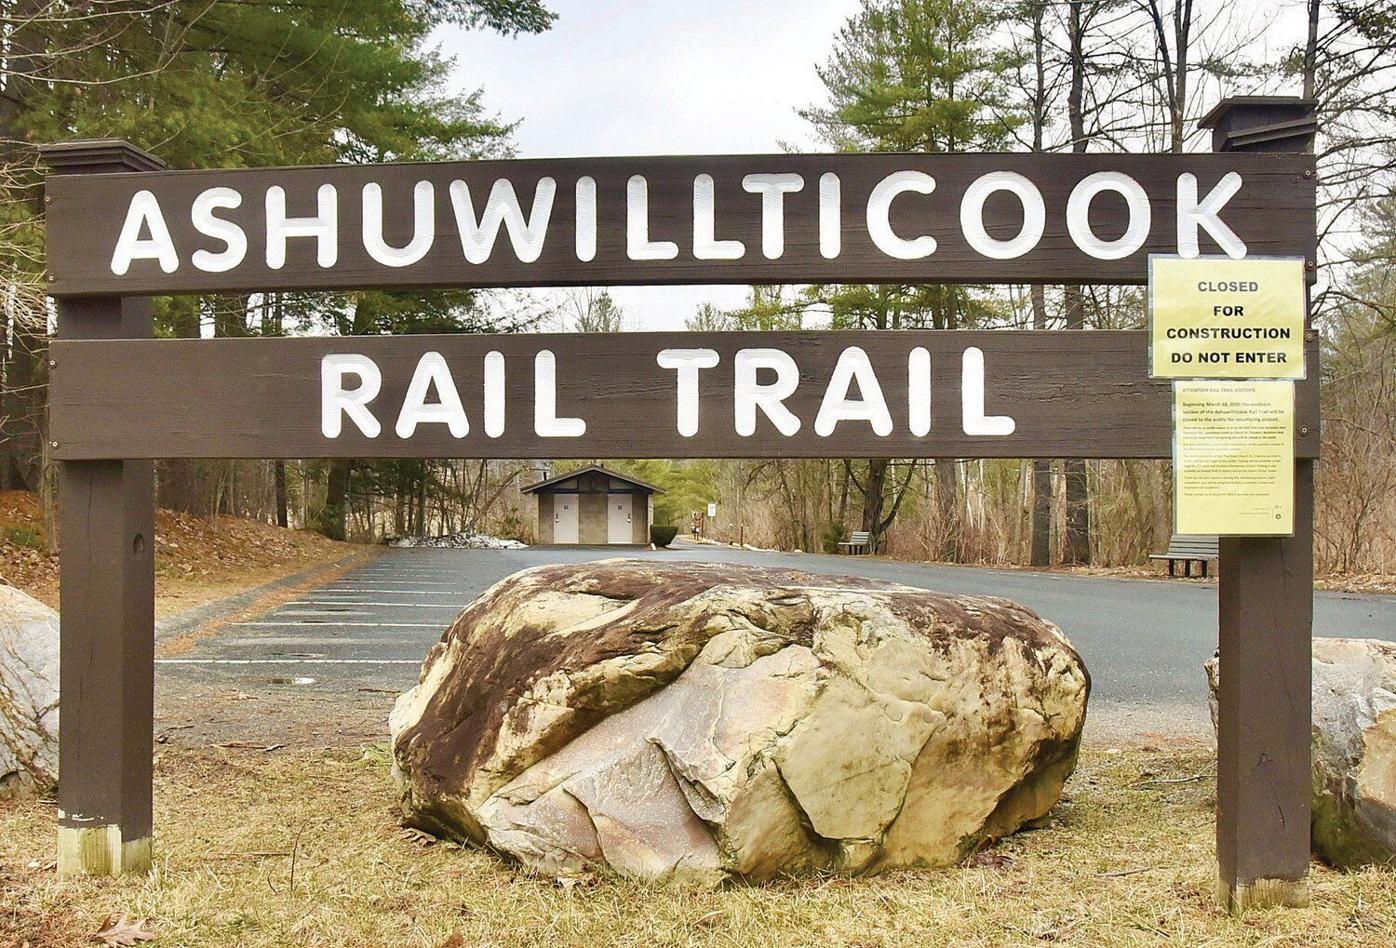 Resurfacing work will close Ashuwillticook Rail Trail in phases